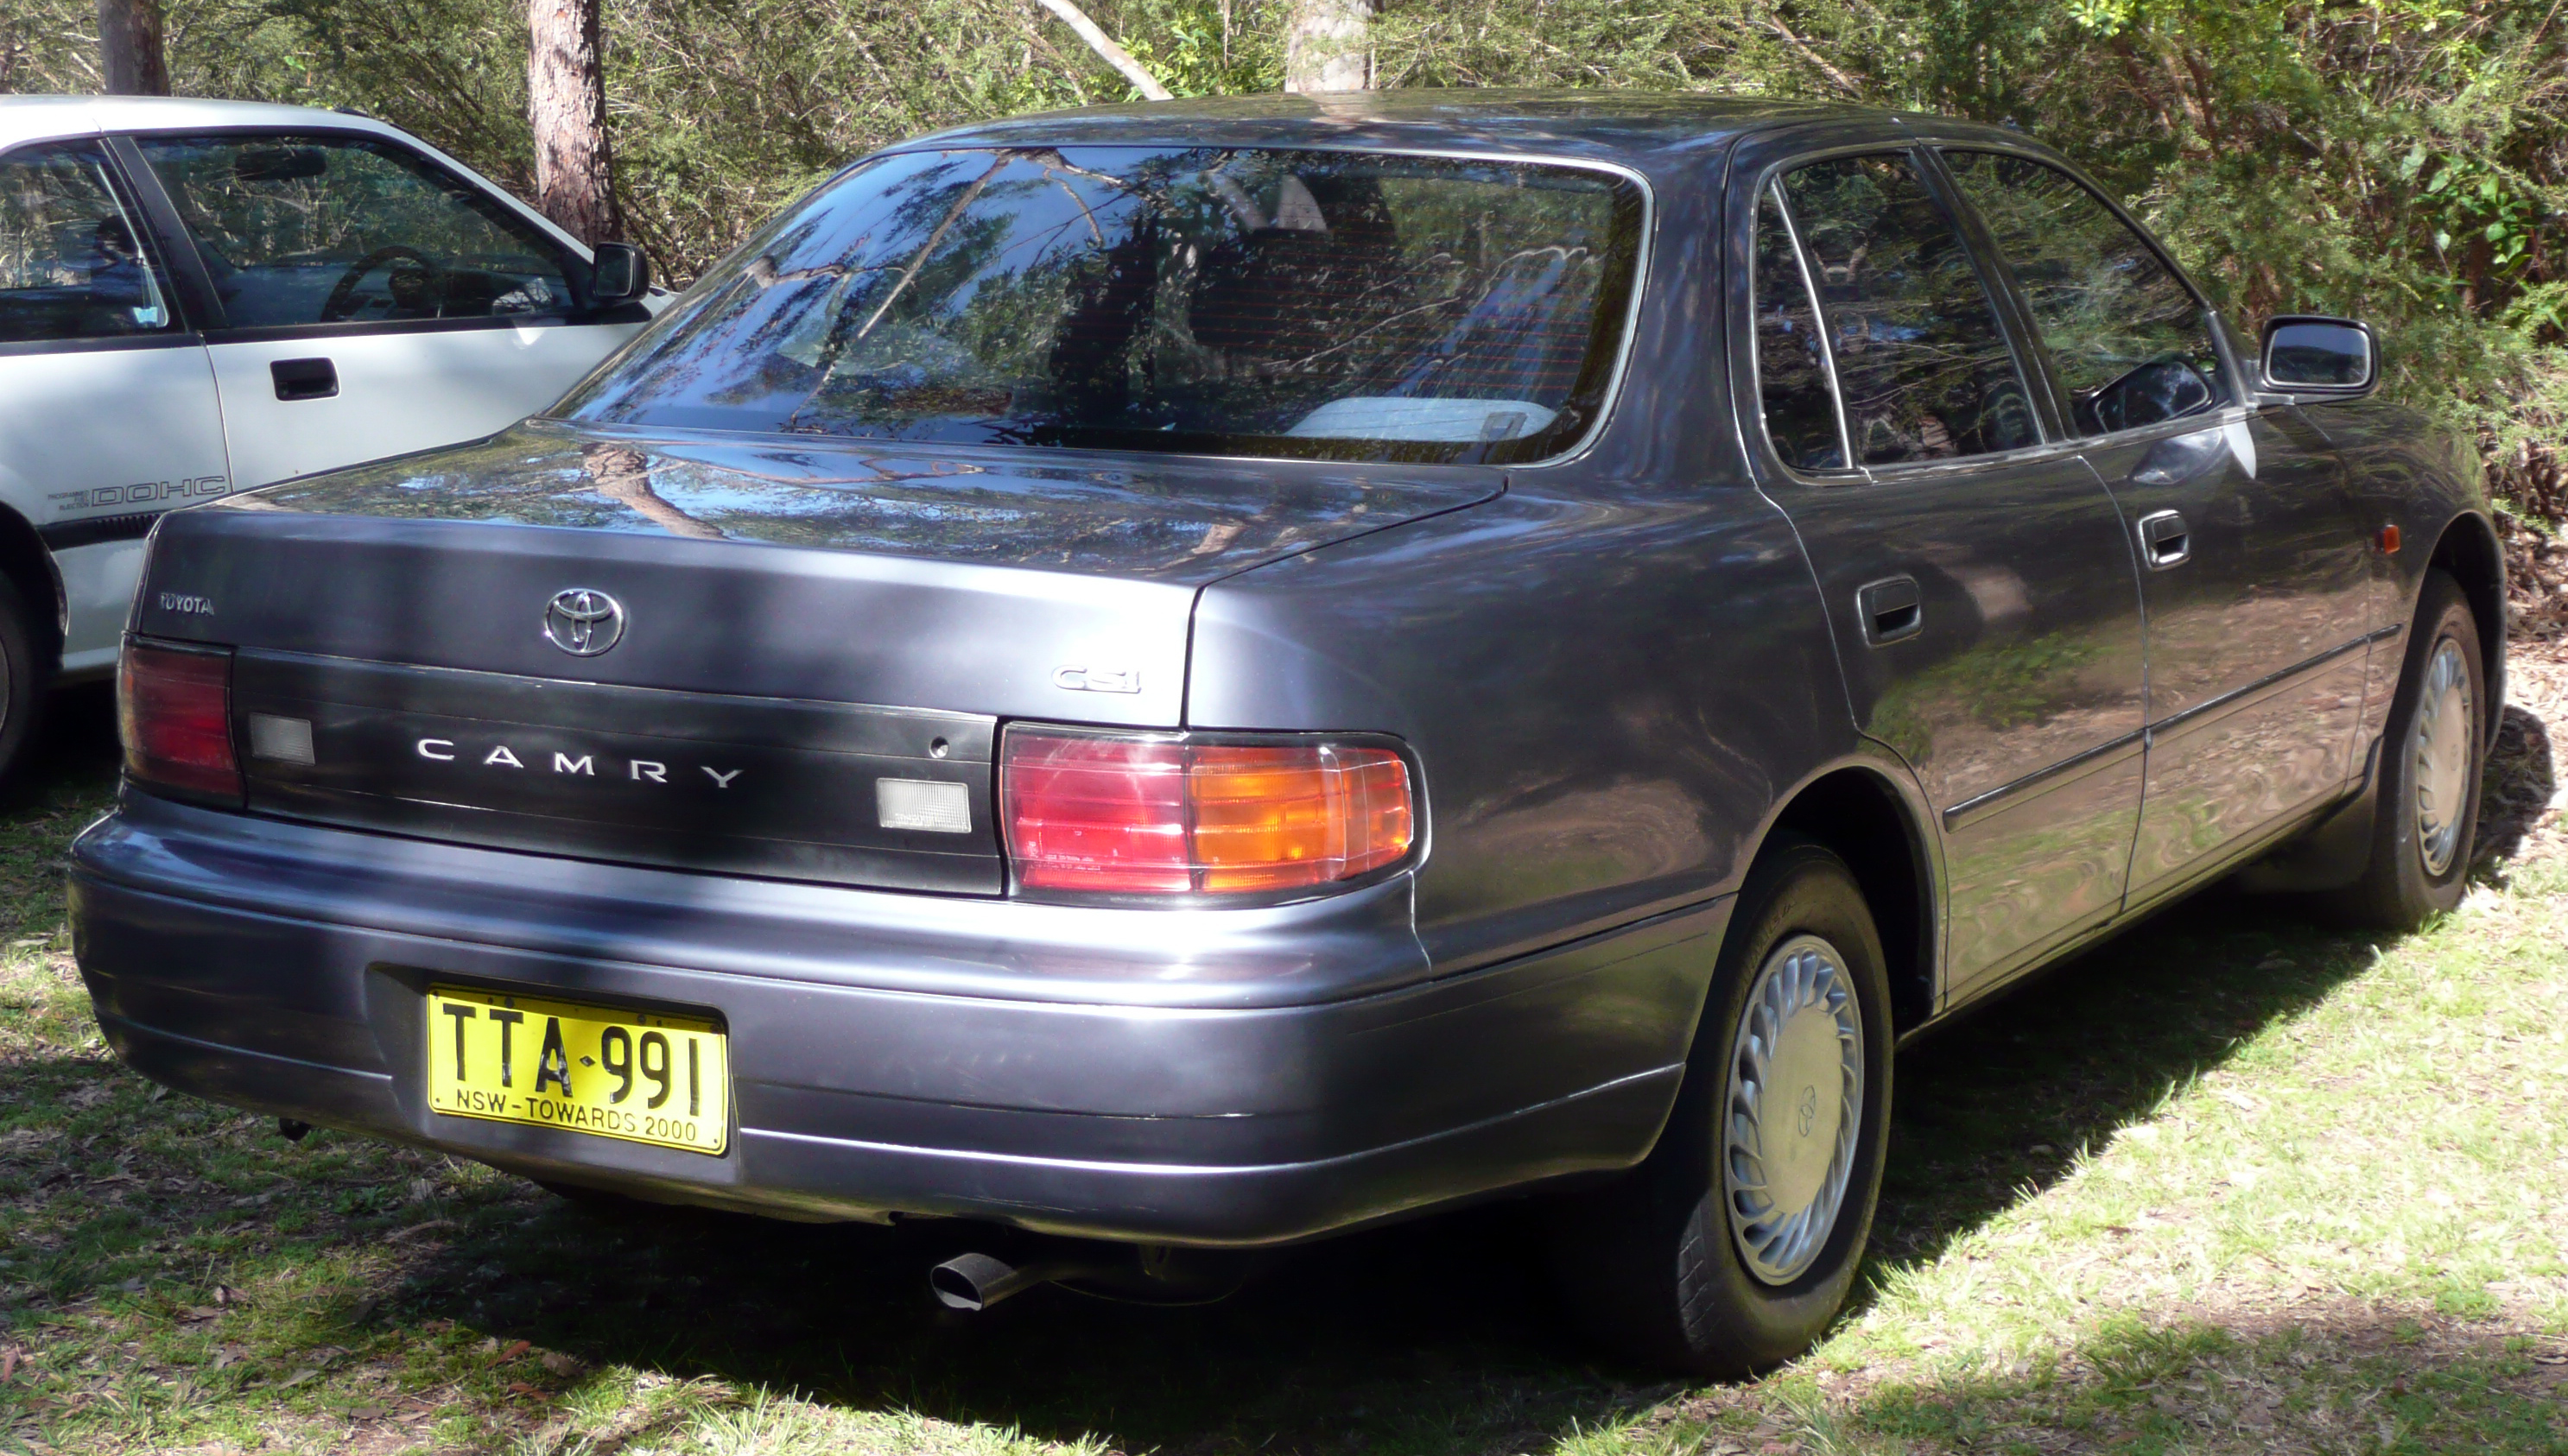 File:1994-1995 Toyota Camry (SDV10) CSi sedan 01.jpg - Wikimedia Commons